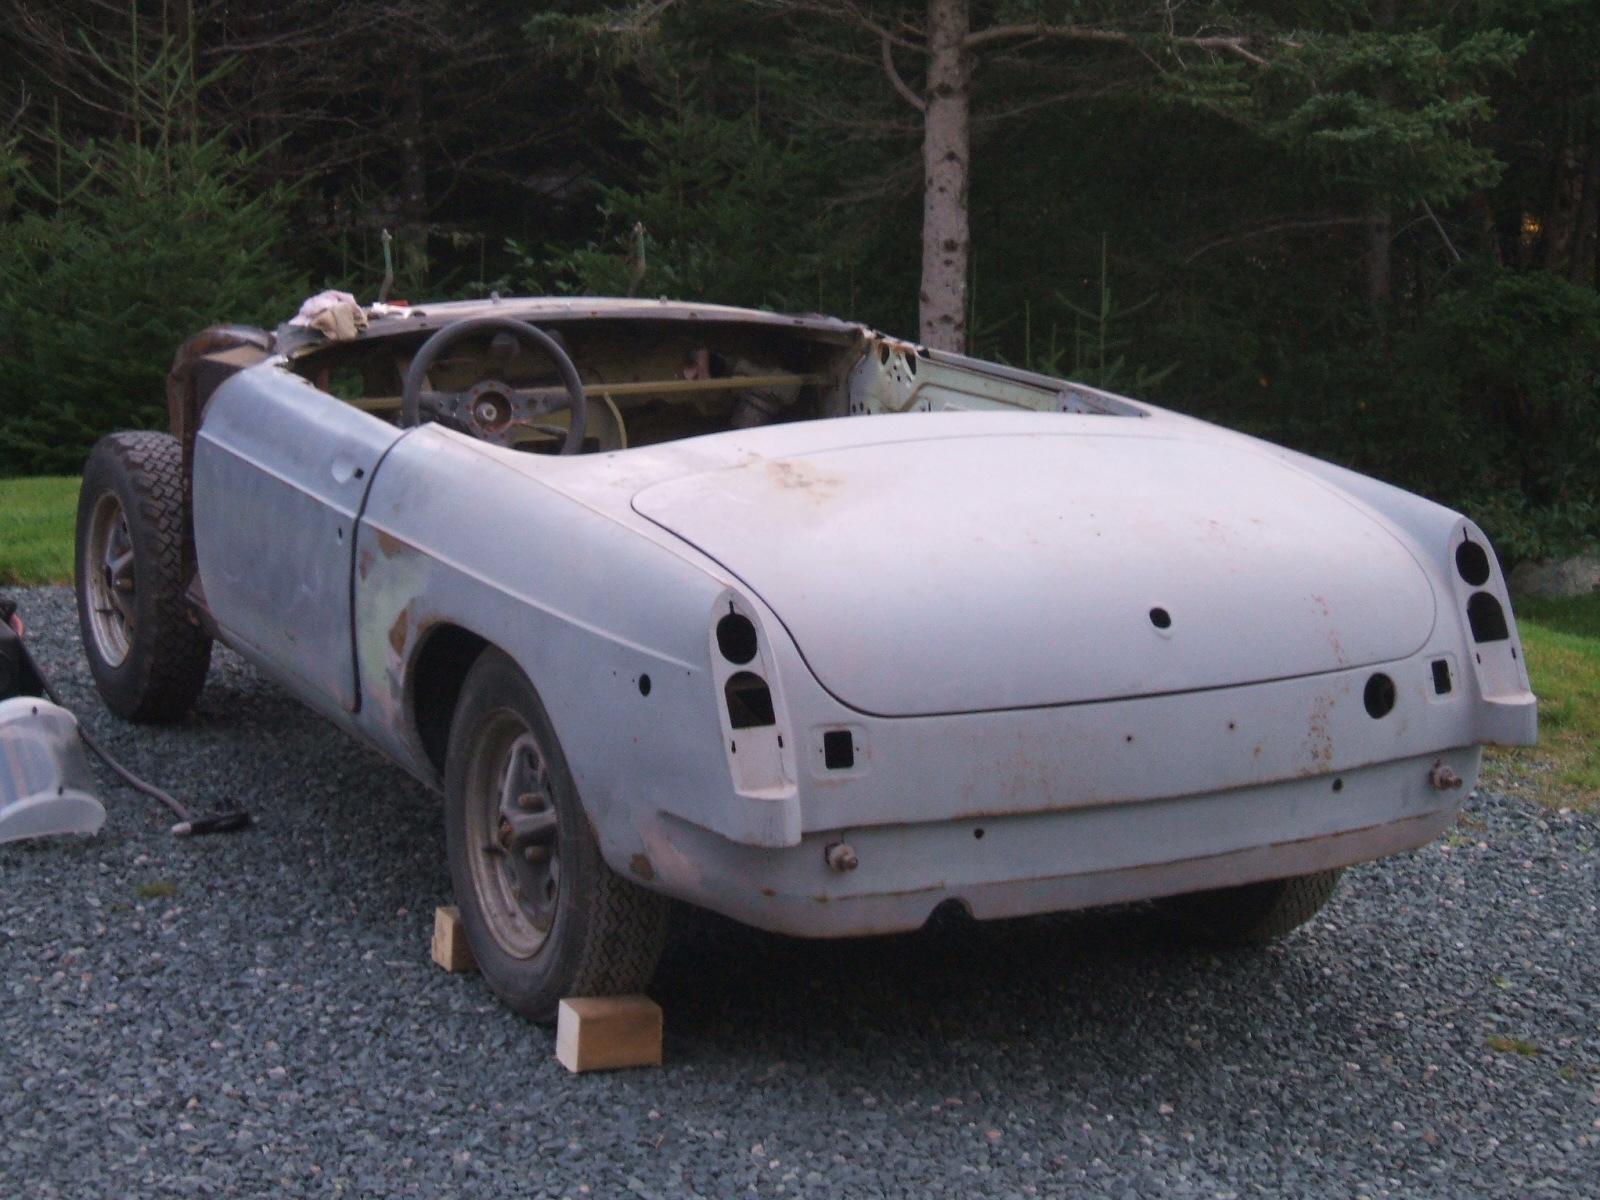 Newfoundland British Automobile Association Owners